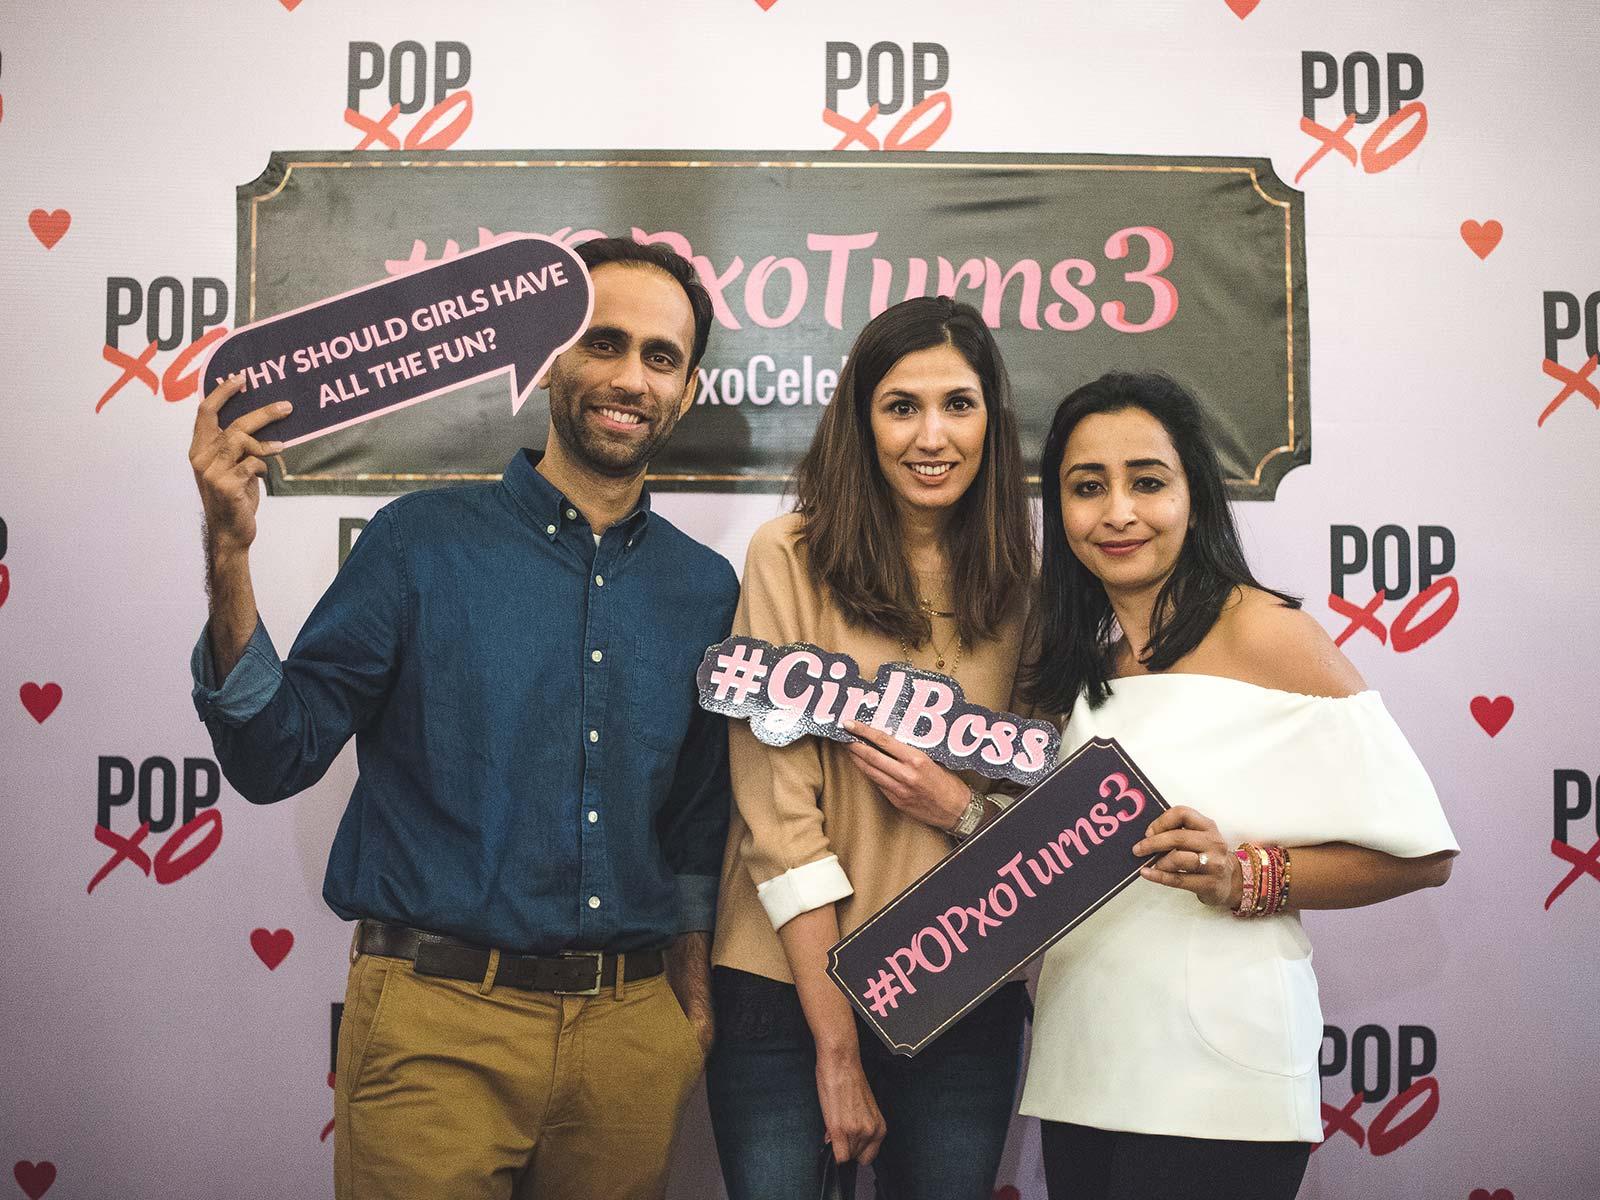 Dhruv Mathur, Suchita Salwan with Priyanka Gill at the #POPxoTurns3 party